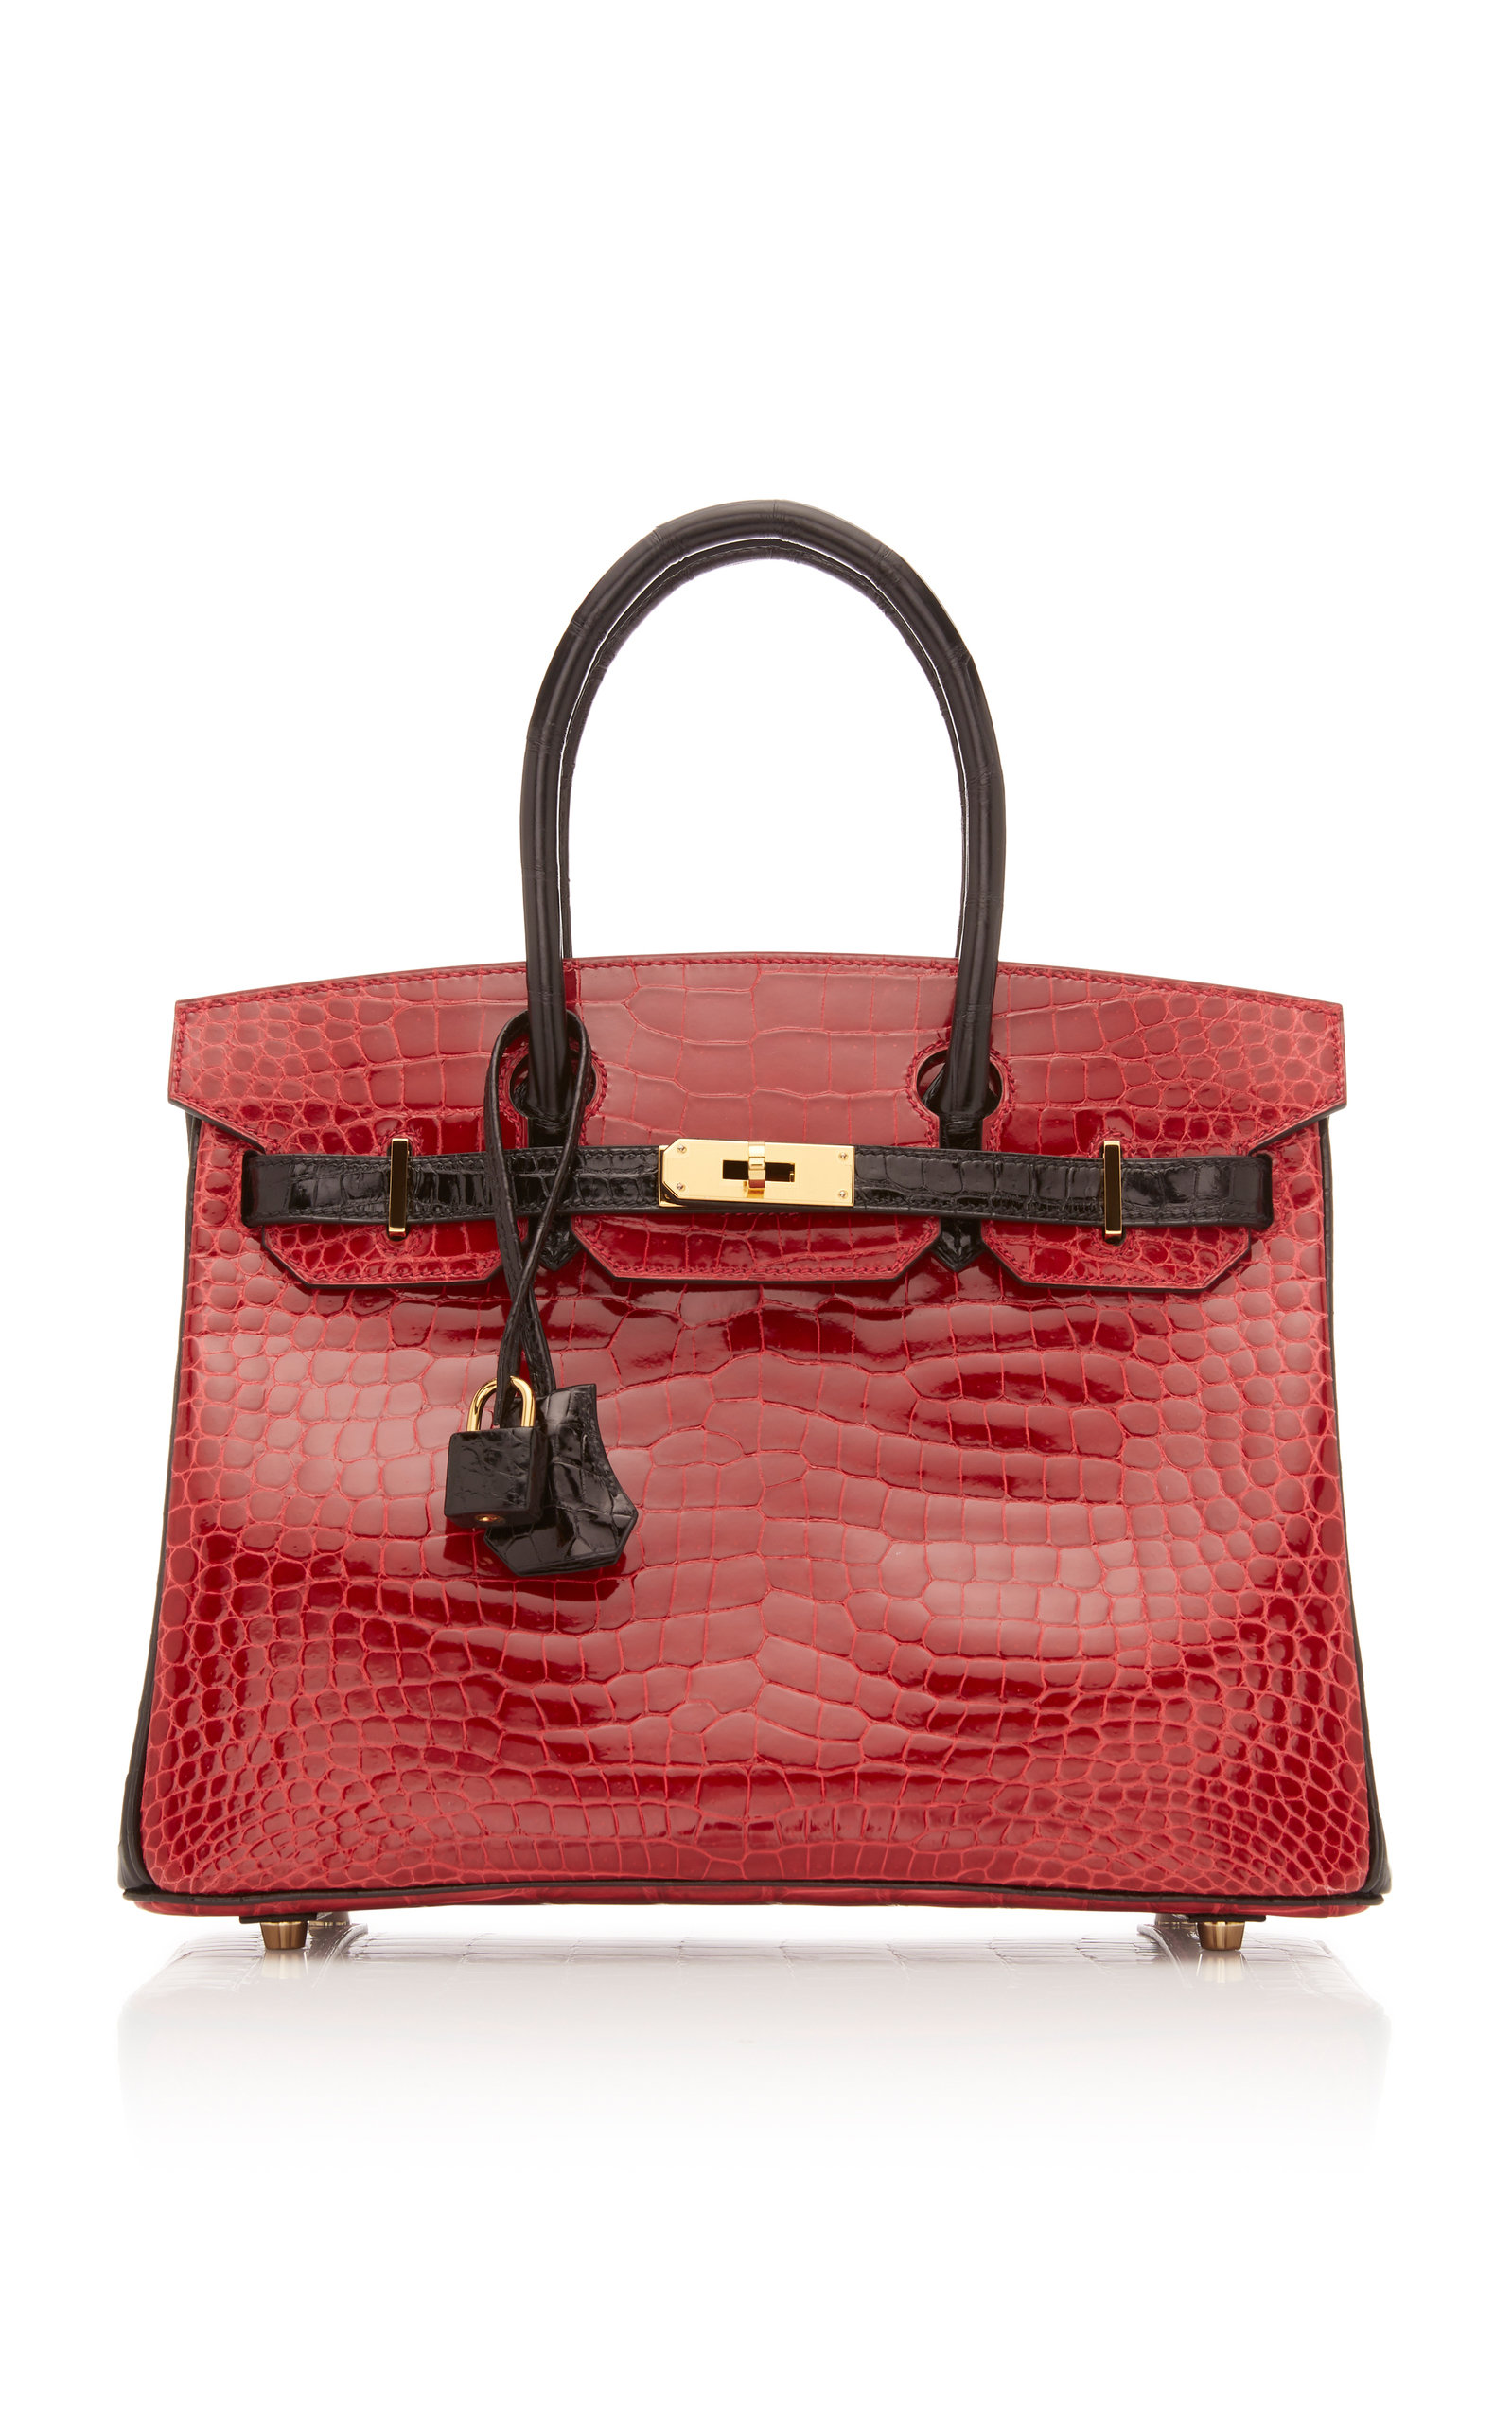 6d7561263c4c Hermès Vintage by Heritage AuctionsHermes 30cm Shiny Briase and Black  Porosus Crocodile Special Order Horseshoe Birkin